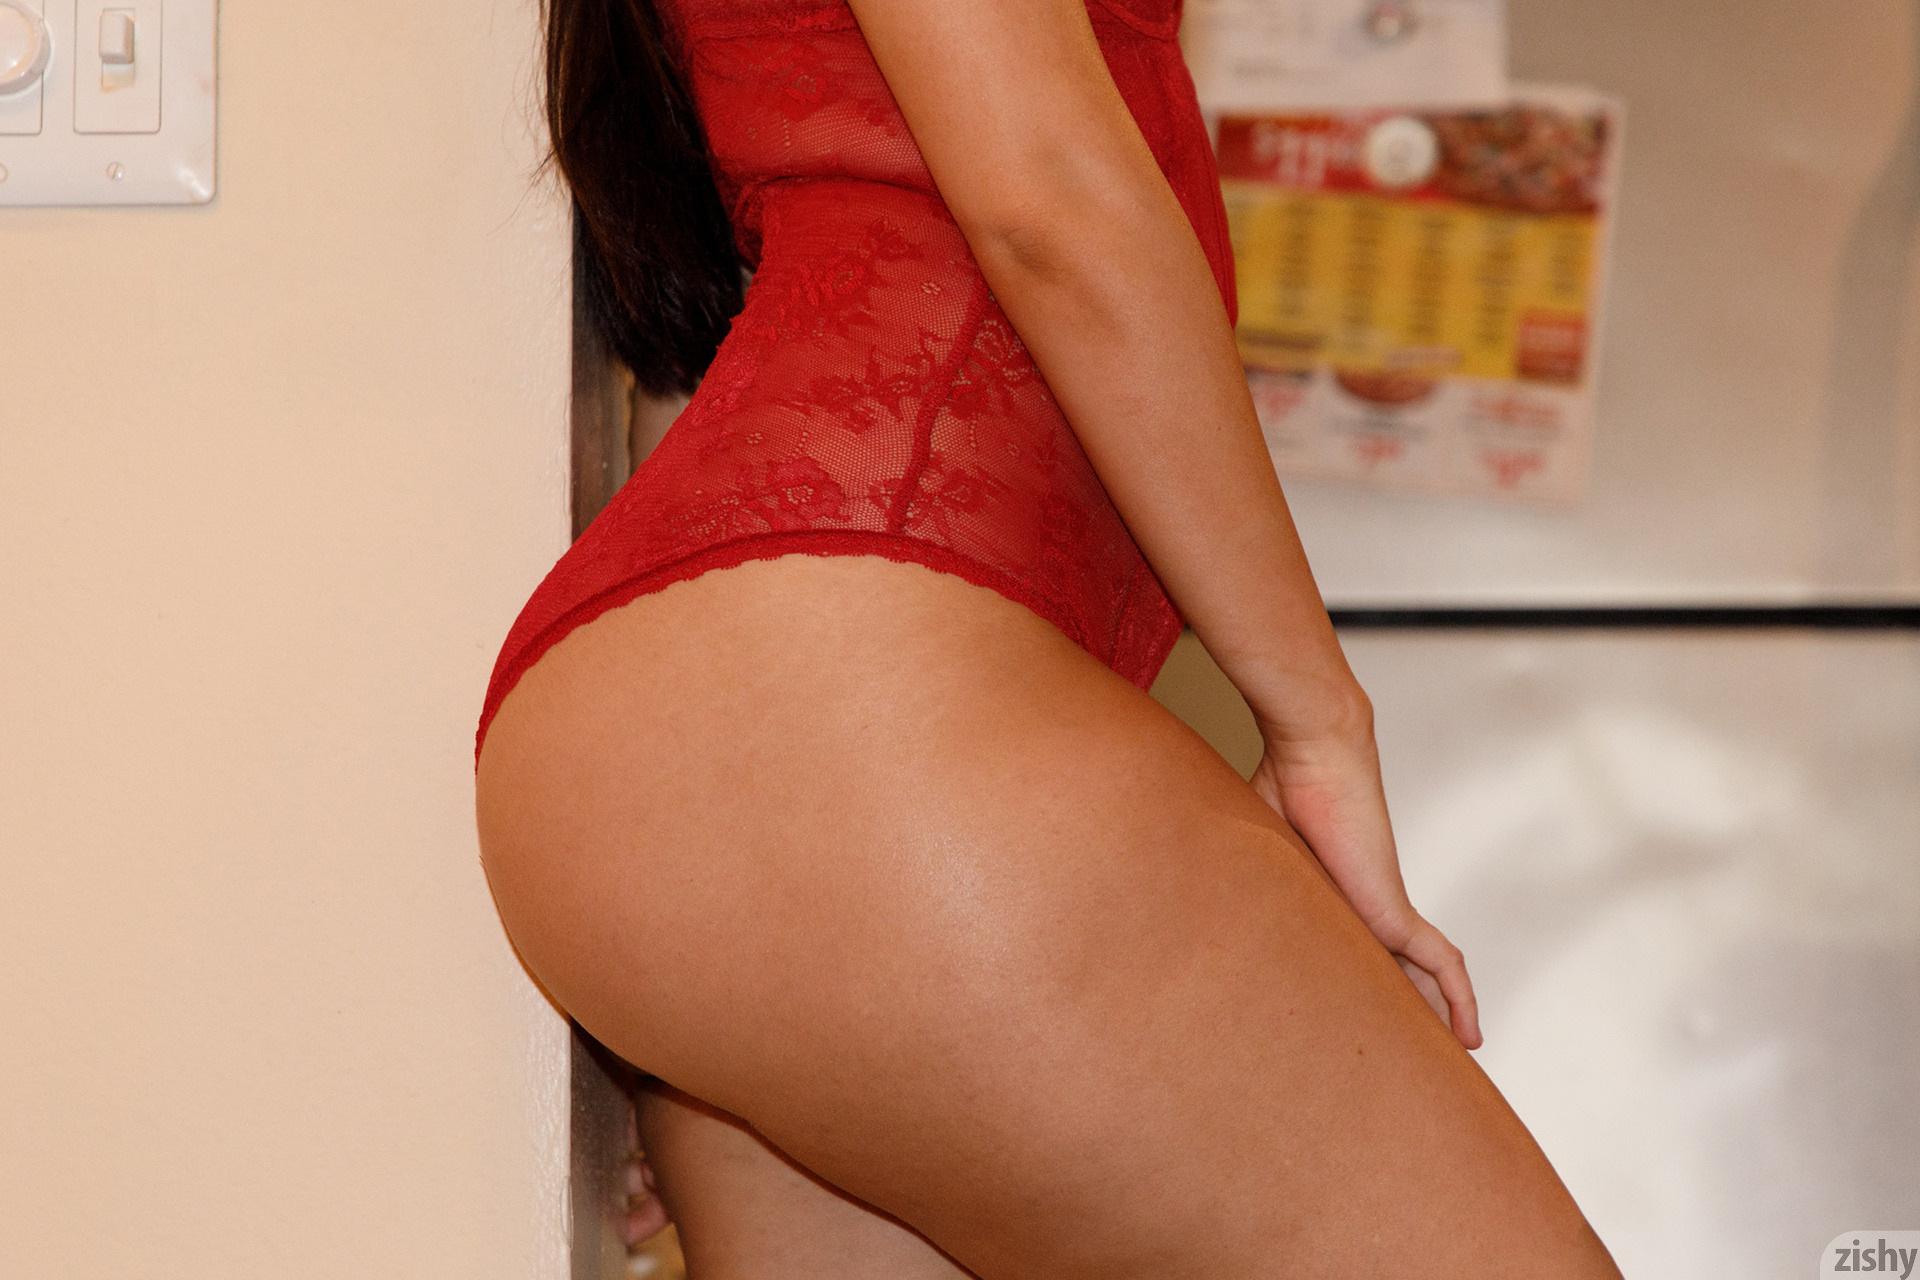 Eloisa Guerra Thirsty Little Devil Zishy (5)